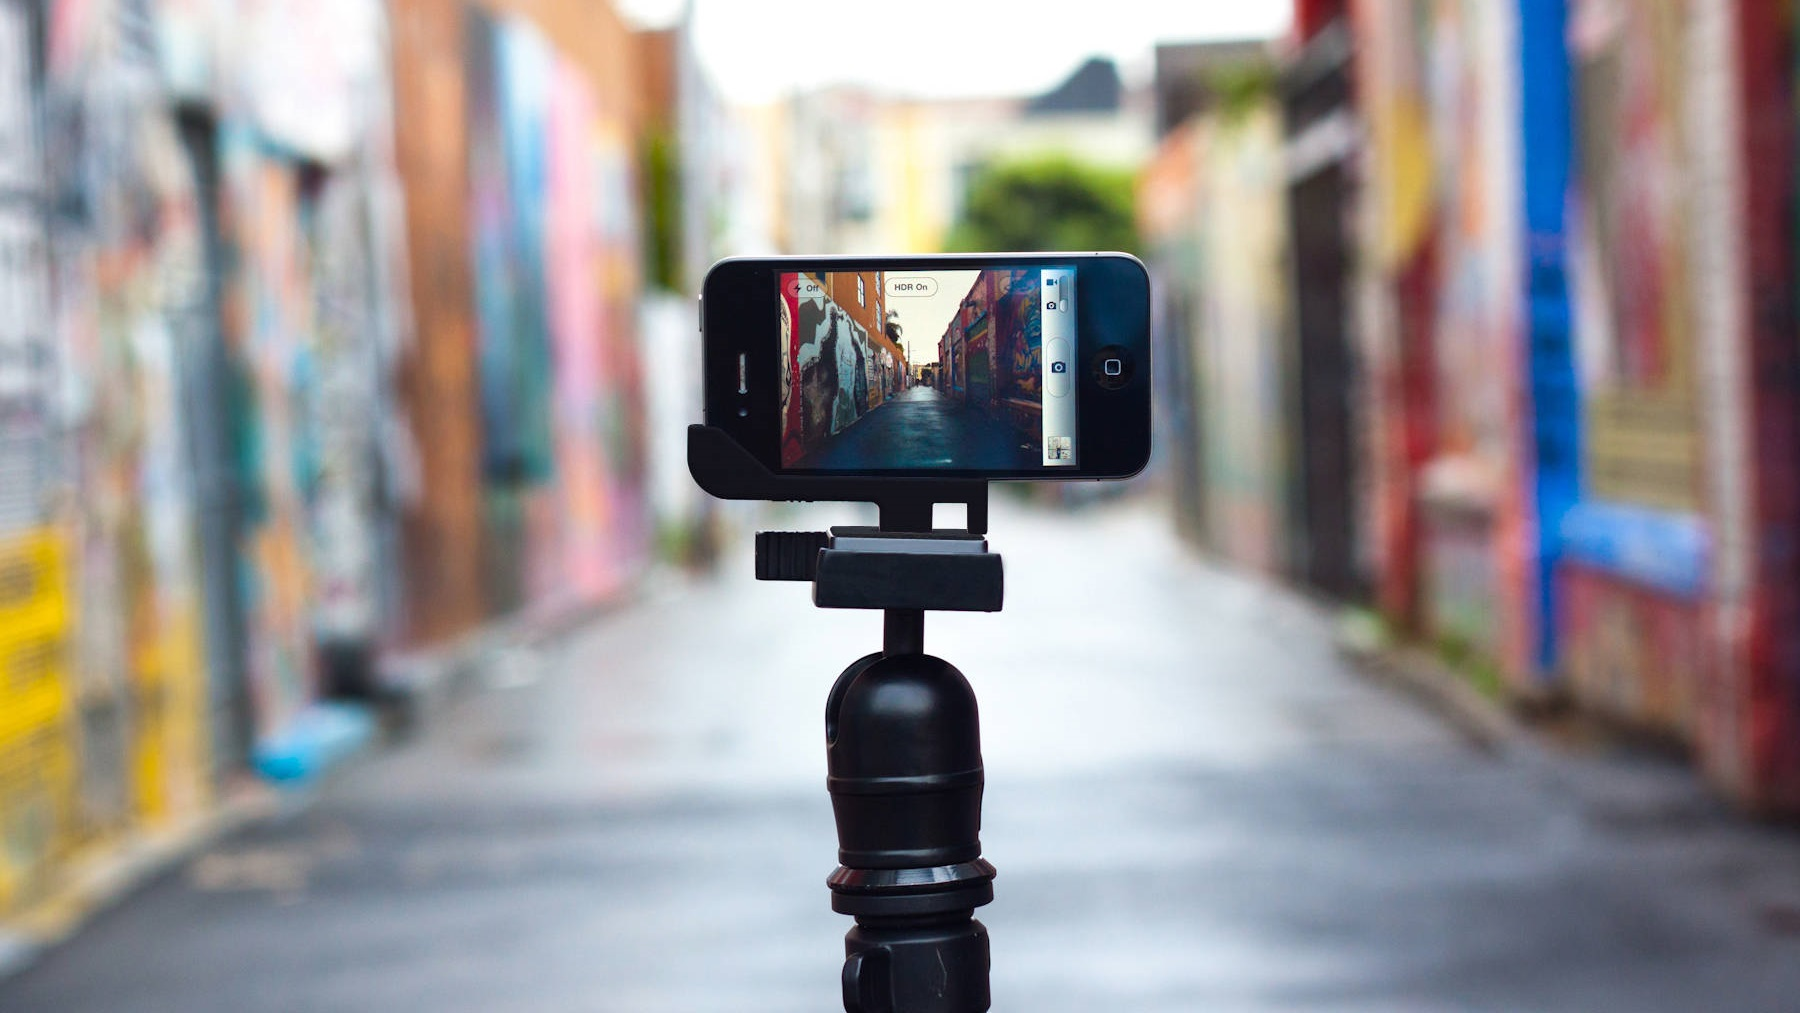 tripod kamera smartohone - Fotos Increíbles con tu Celular